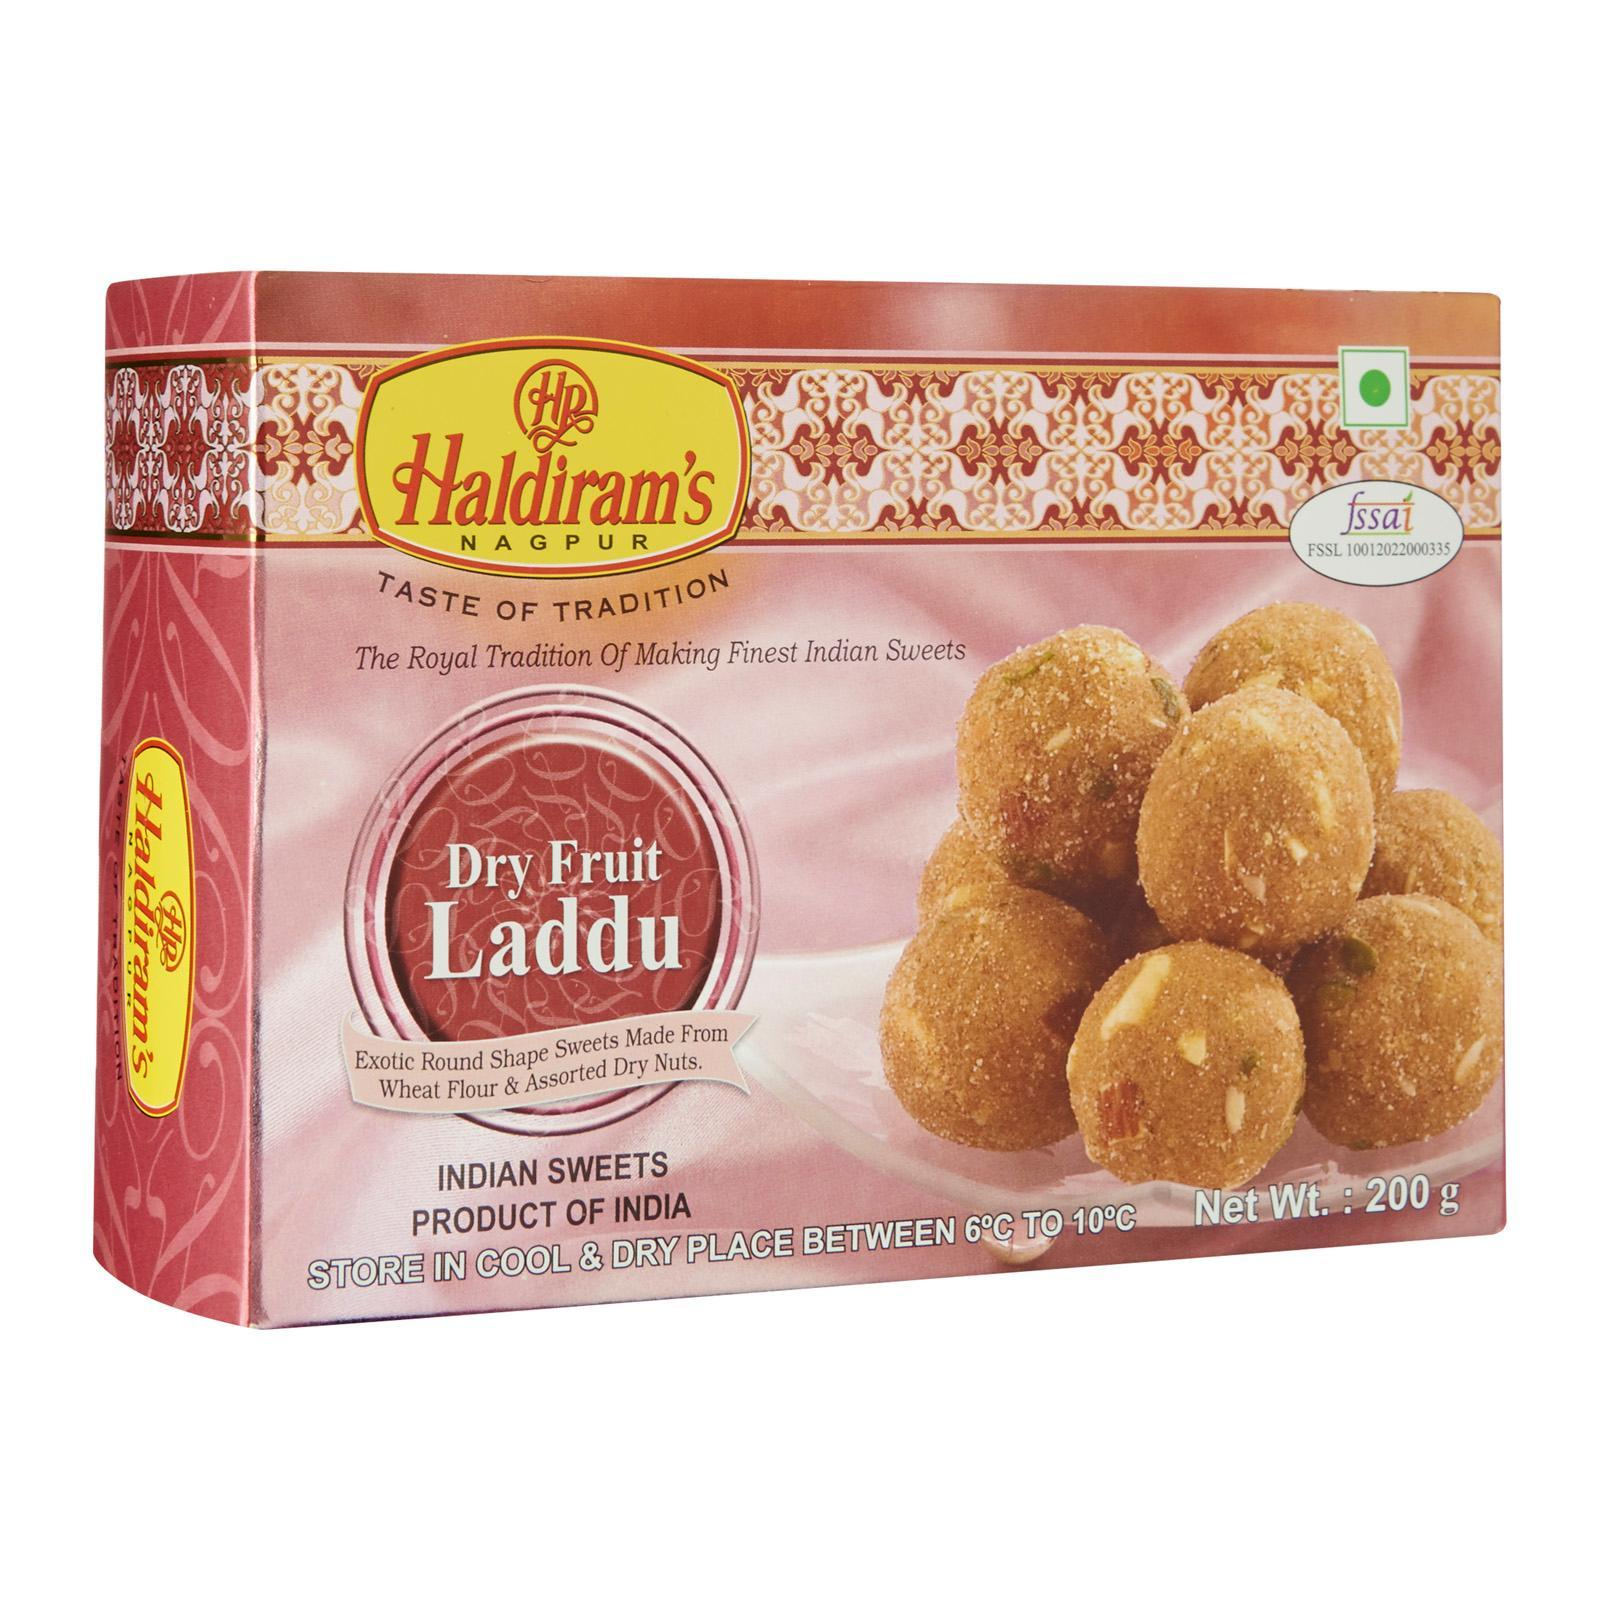 Haldiram's Dry Fruit Laddu Sweets